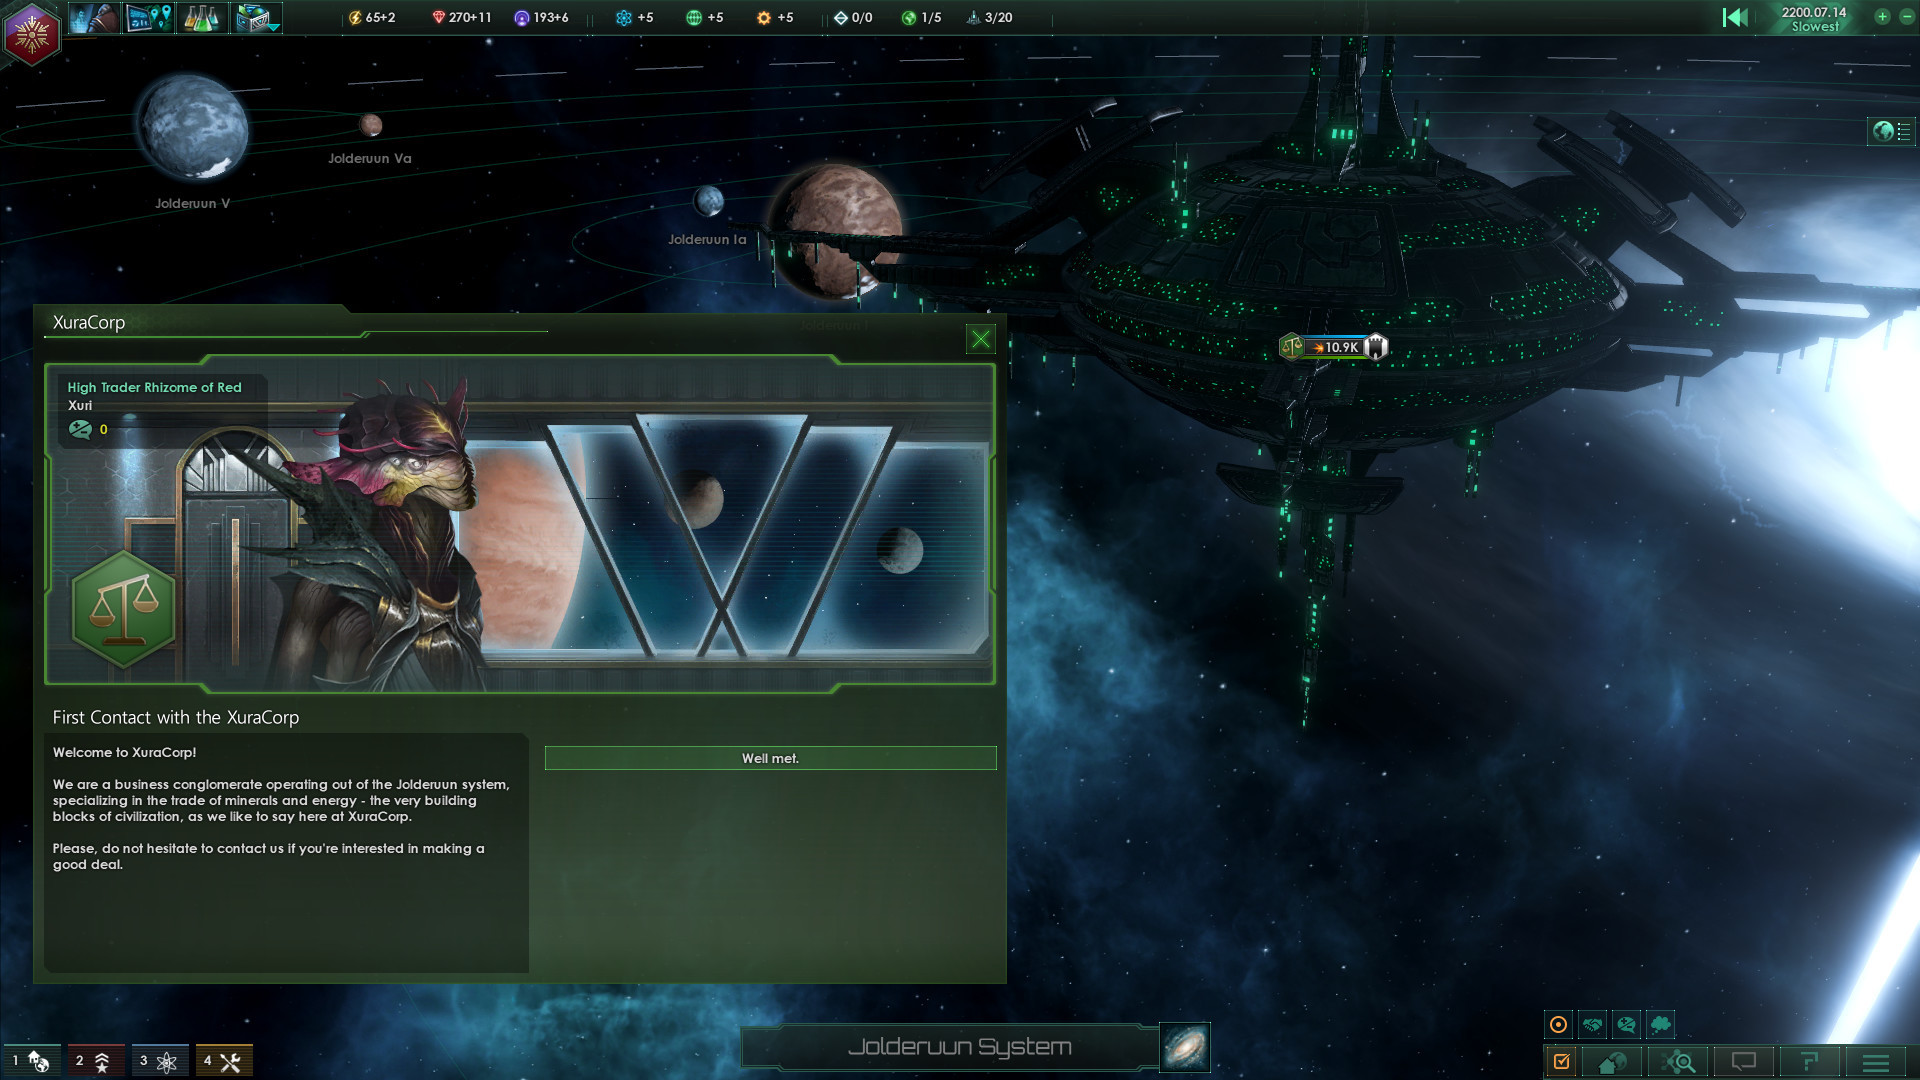 stellaris-galaxy-edition-pc-screenshot-04